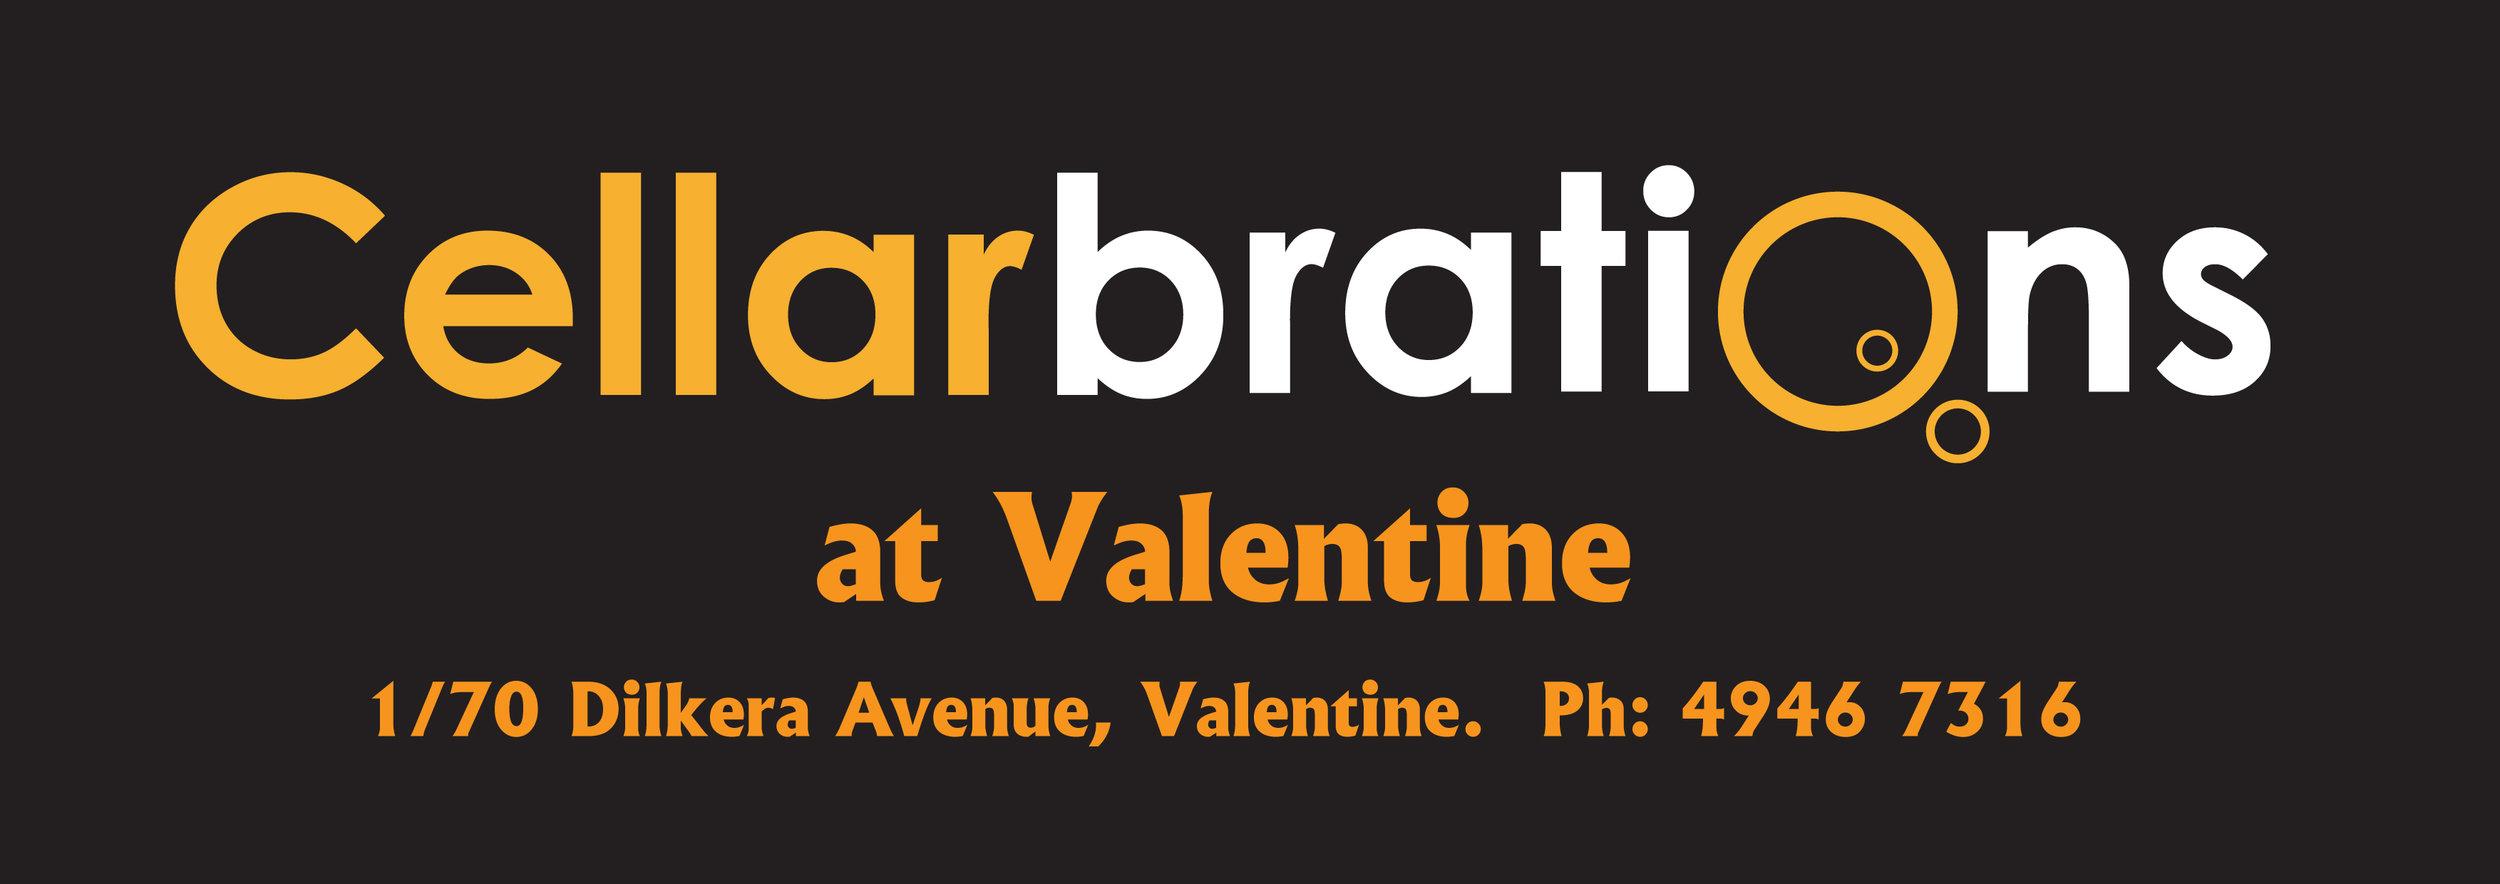 Cellarbrations_Valentine_Logo-Valentine_Public_School_Market_Day copy.jpg